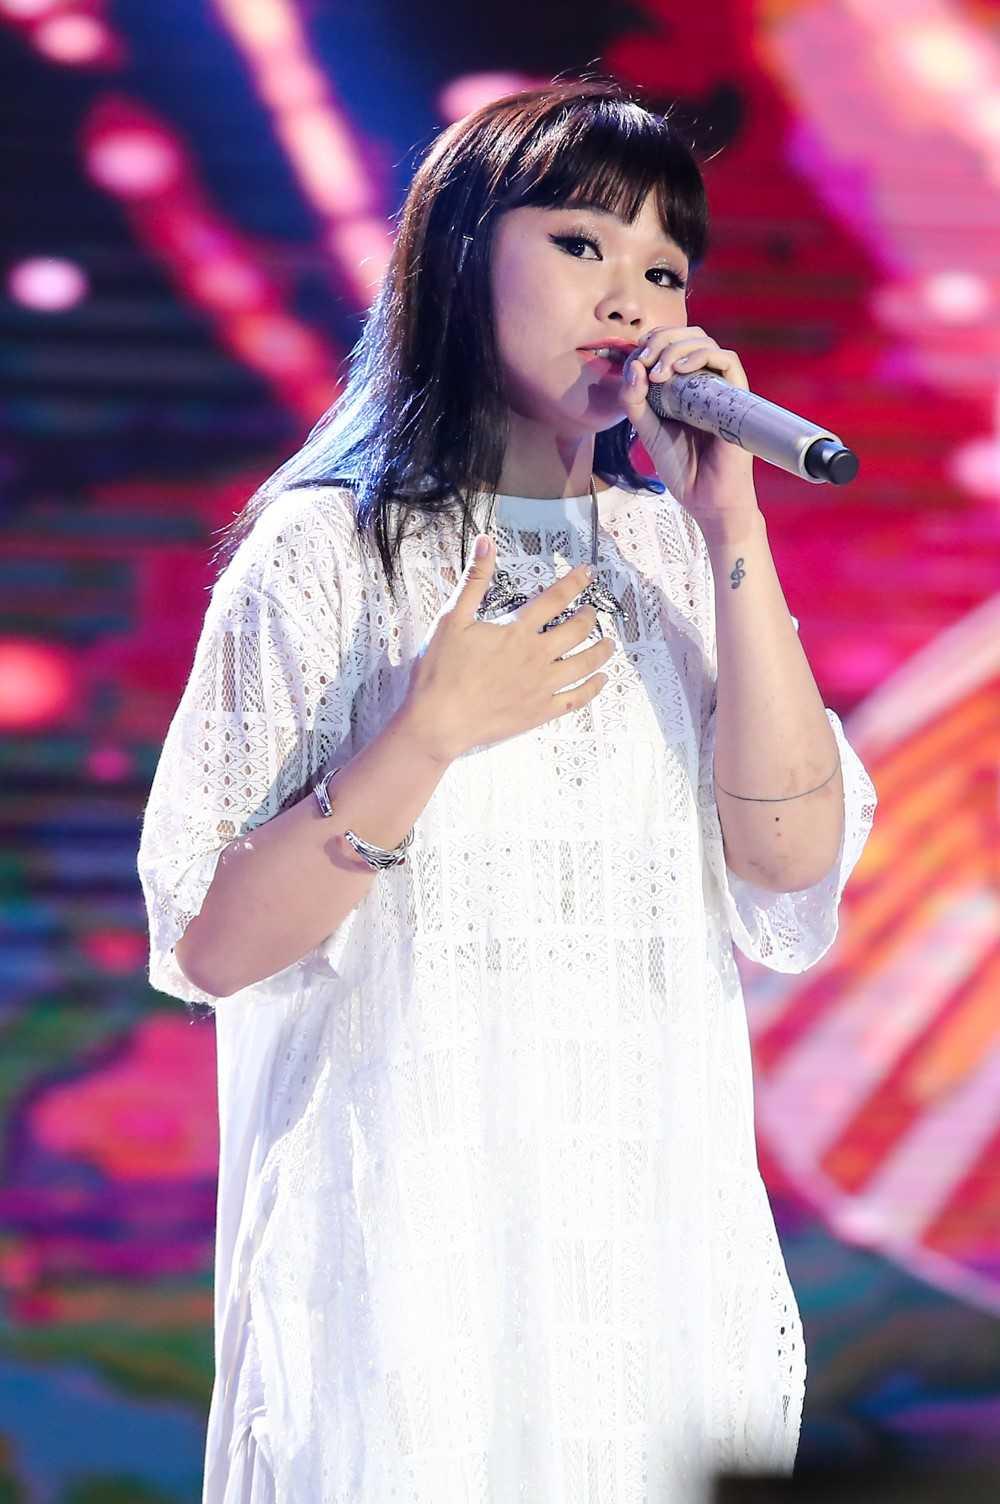 Sing my song: Giong ca 'Bon chu lam' dao loi lan phong cach bieu dien cua nghe si Trung Quoc hinh anh 1